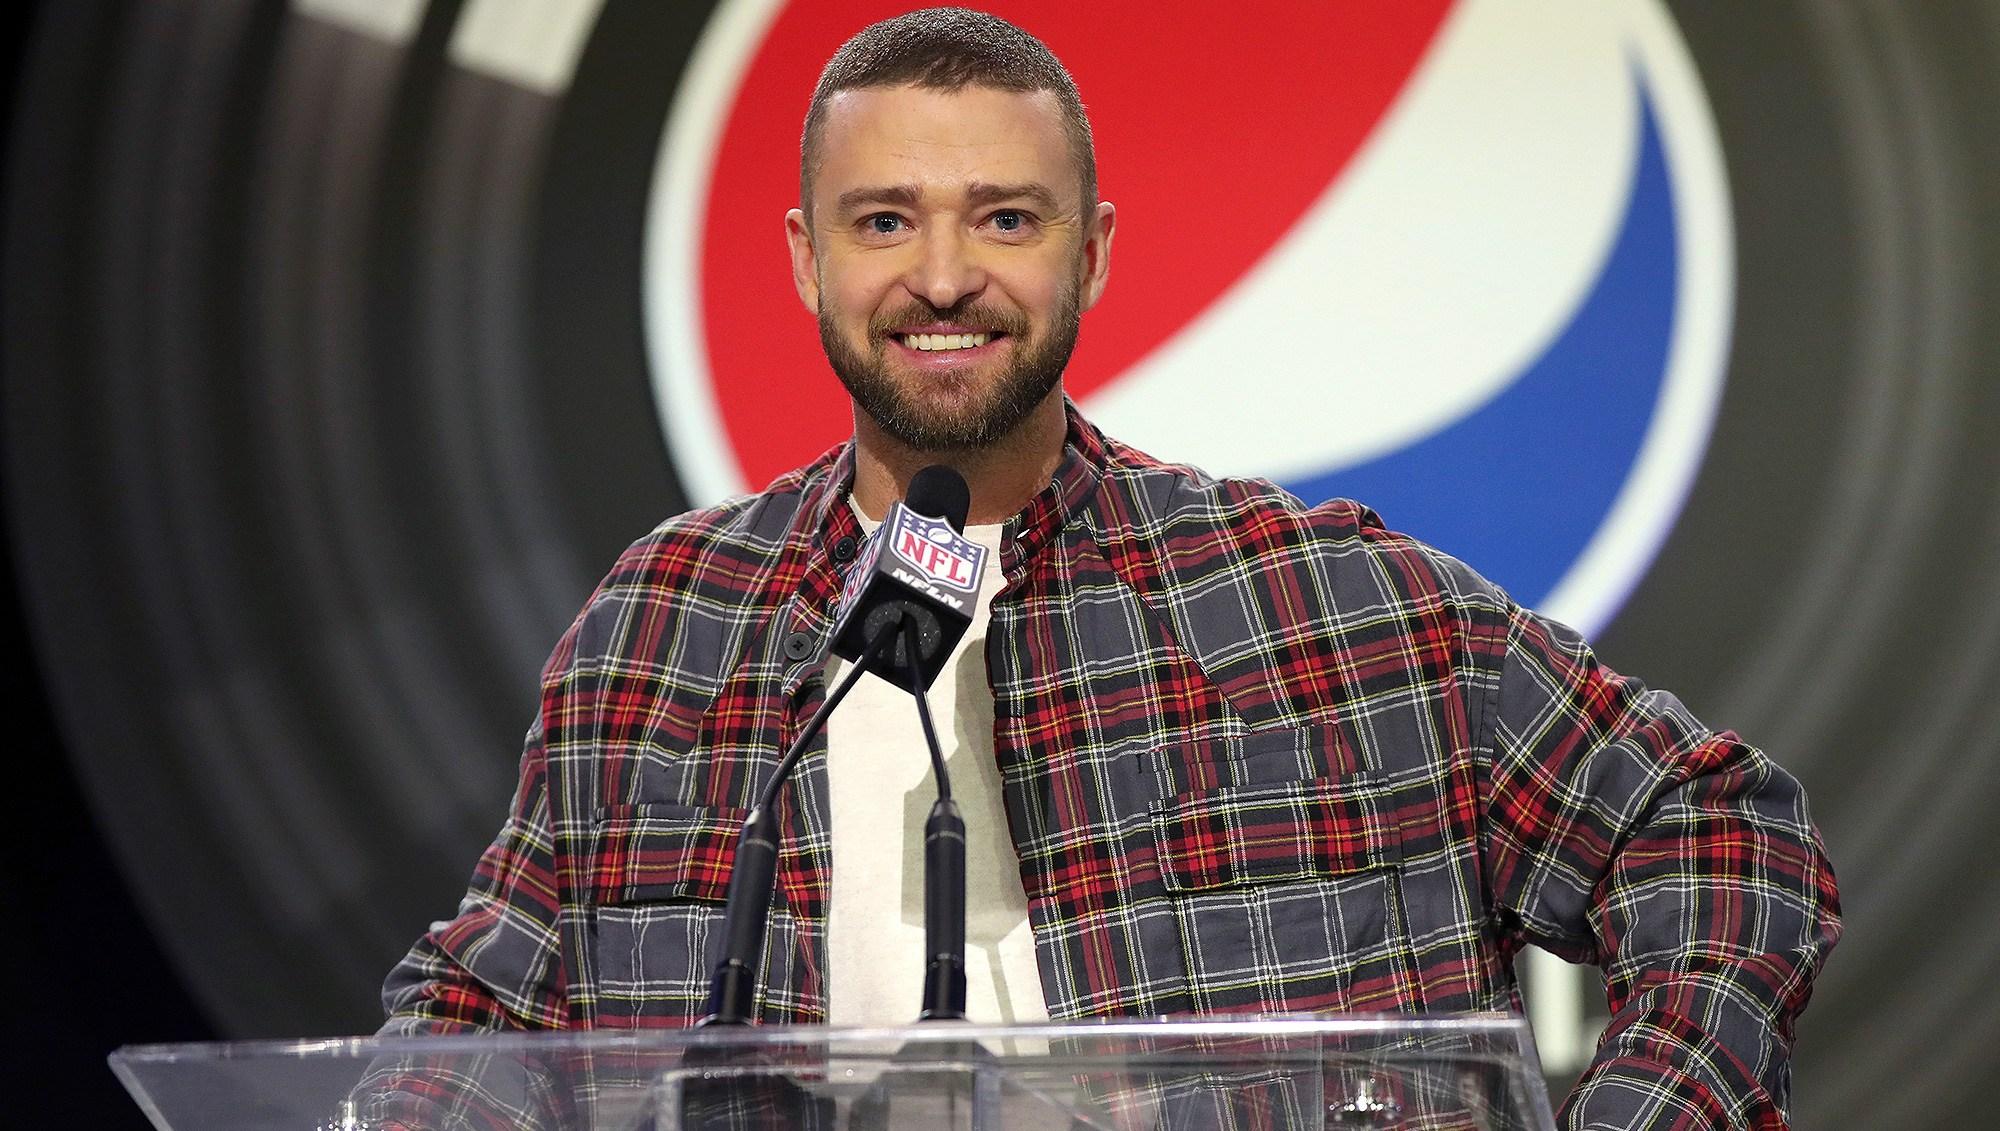 Justin Timberlake, Super Bowl, Halftime Show, Performance